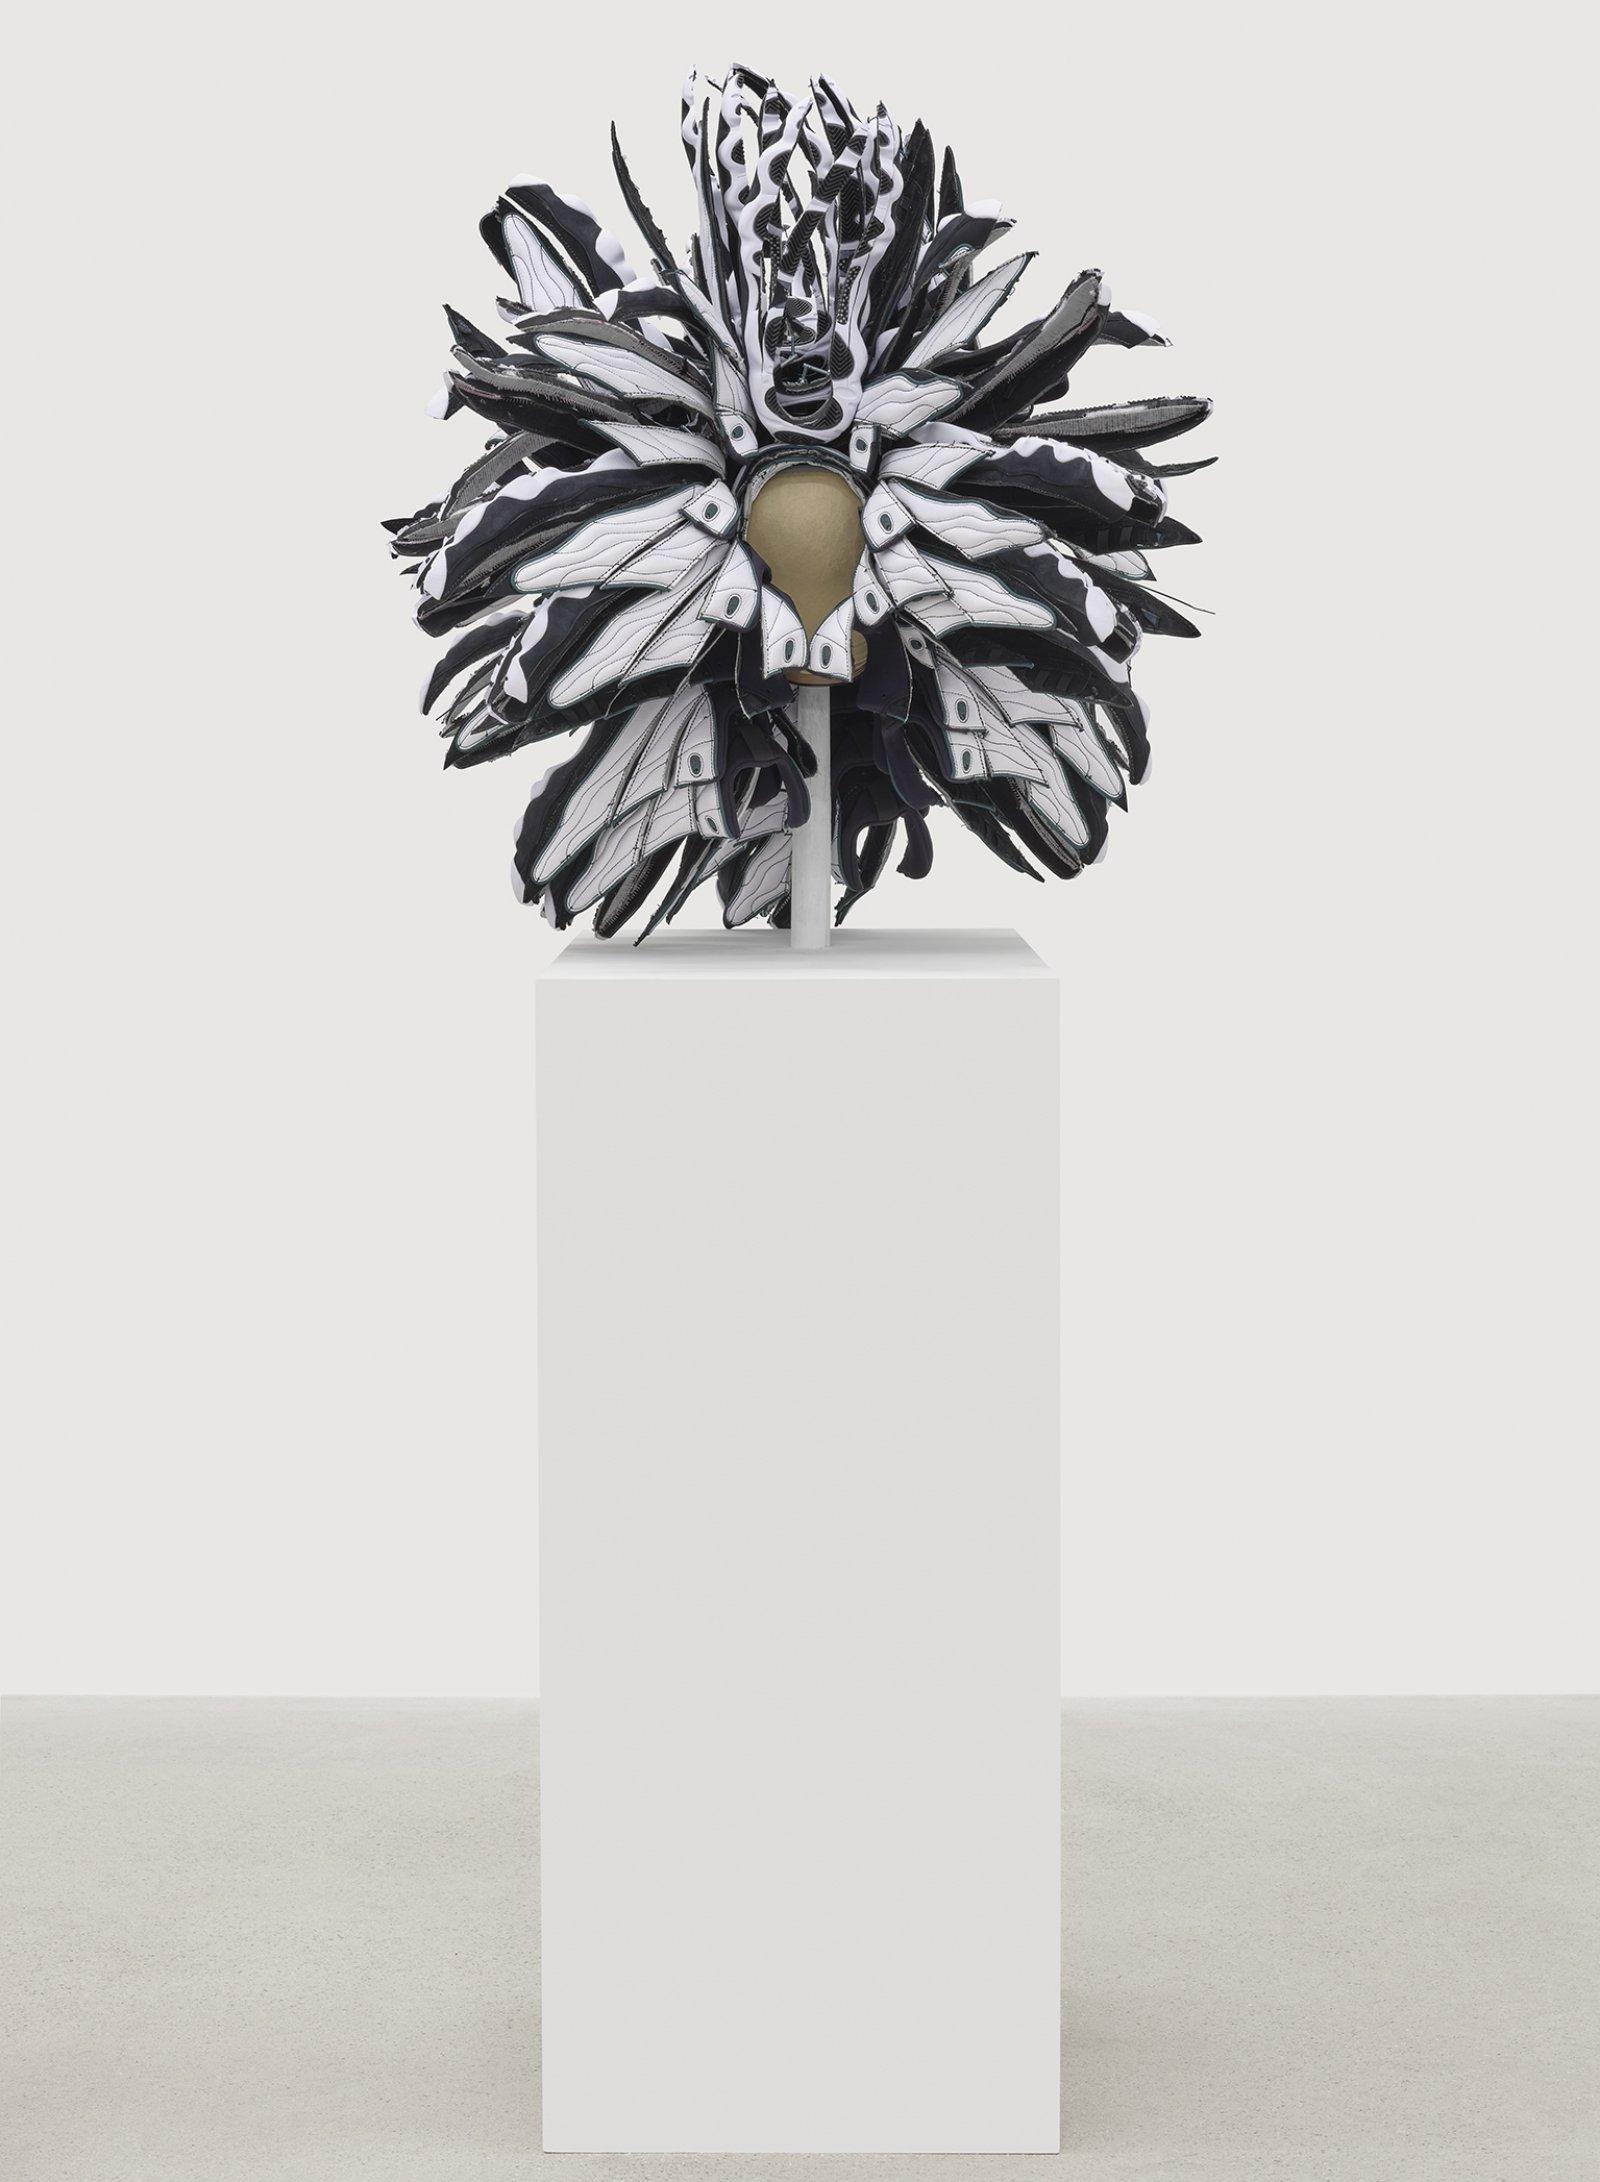 Brian Jungen, Performance bonnet, 2019, nike air jordans, 32 x 31 x 30 in. (81 x 79 x 76 cm)